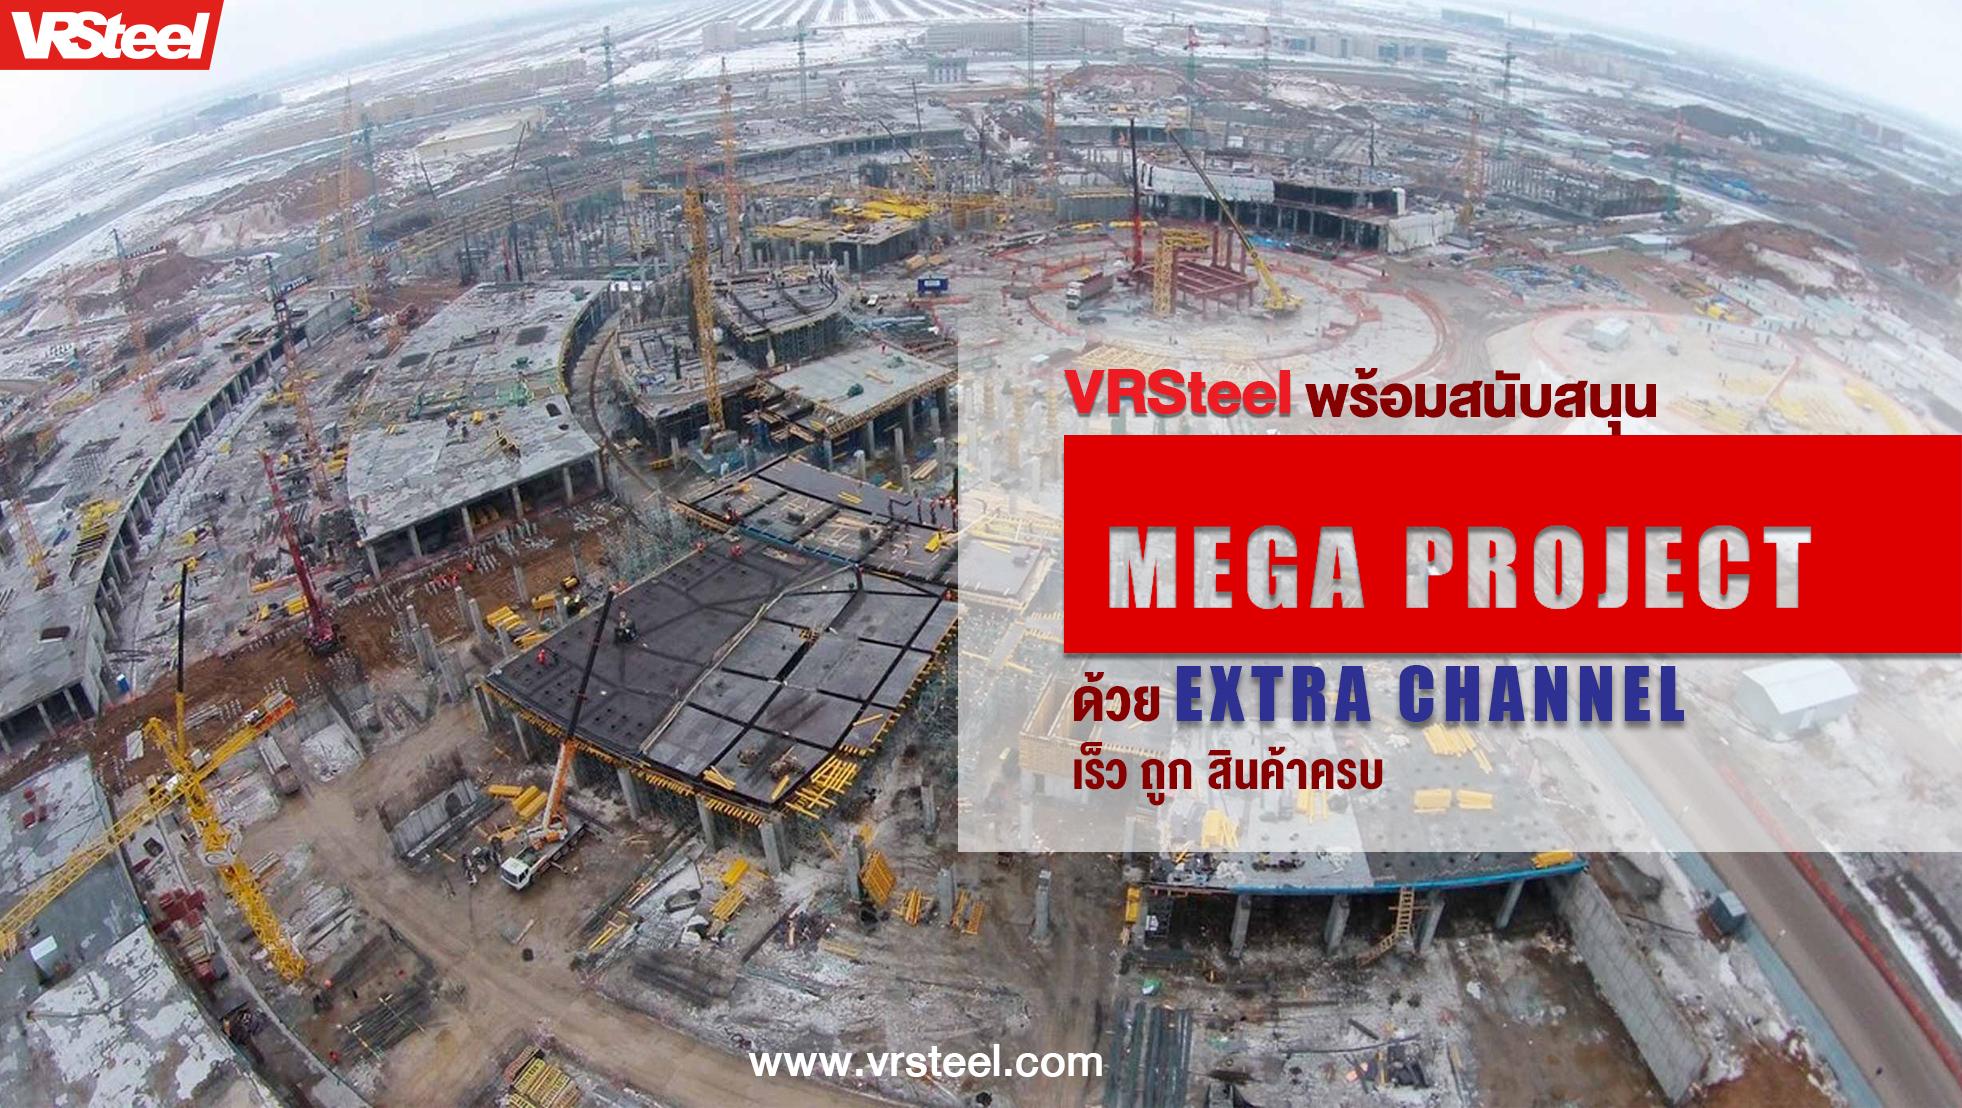 VRSteel พร้อมสนับสนุน Mega Project ด้วย Extra Channel